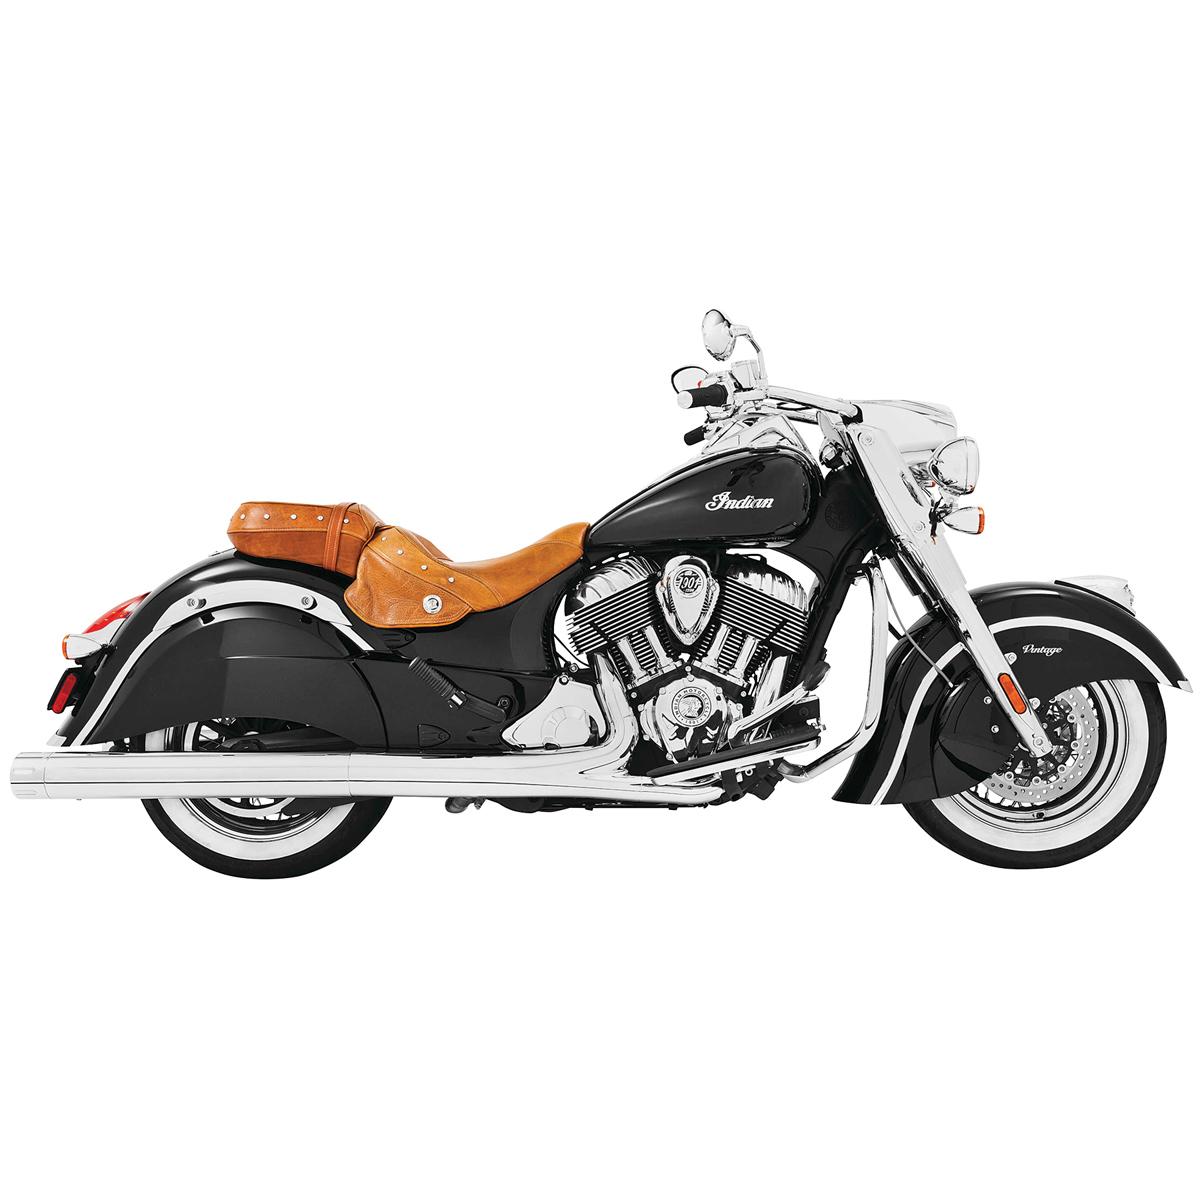 Freedom Performance Exhaust 4″ Chrome Eagle Slip-On Mufflers